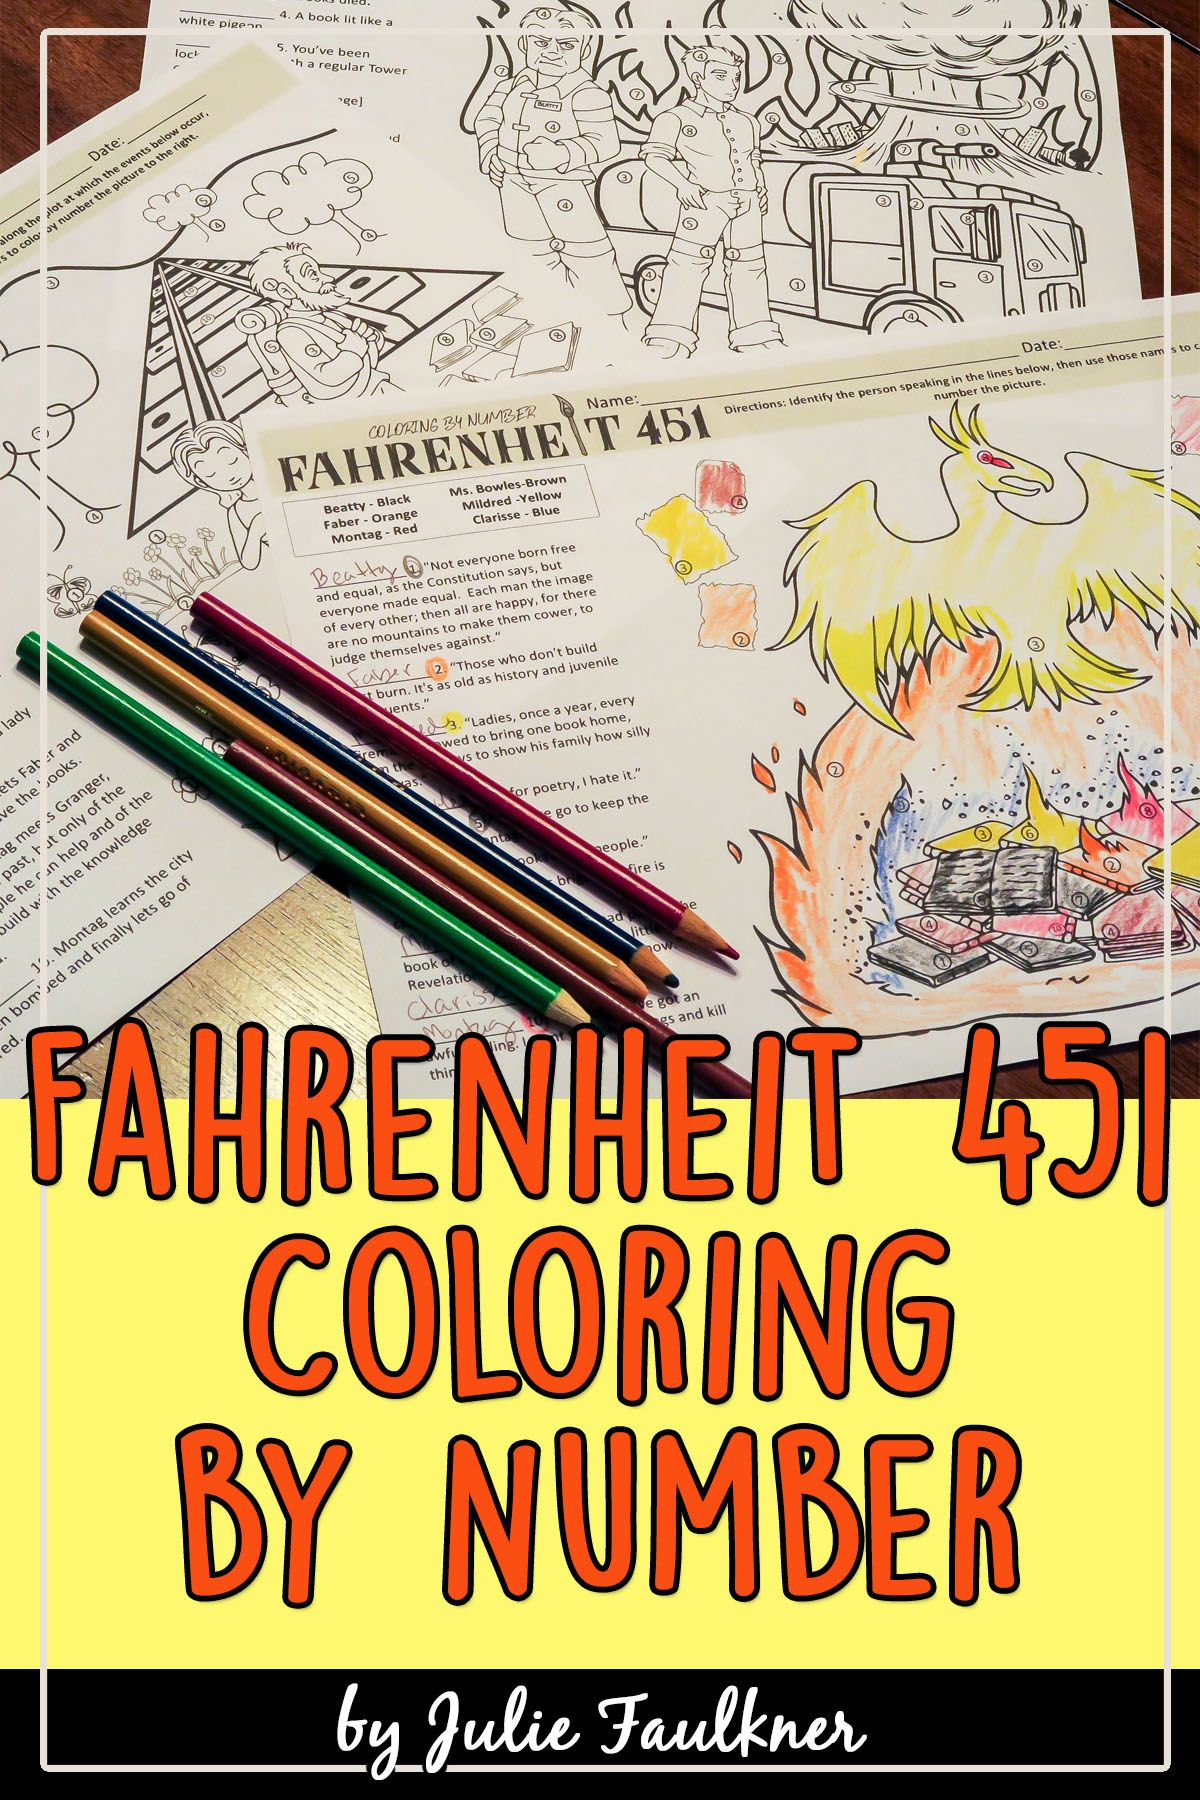 Fahrenheit 451 Coloring Activity Fahrenheit 451 Teaching American Literature Color Activities [ 1800 x 1200 Pixel ]